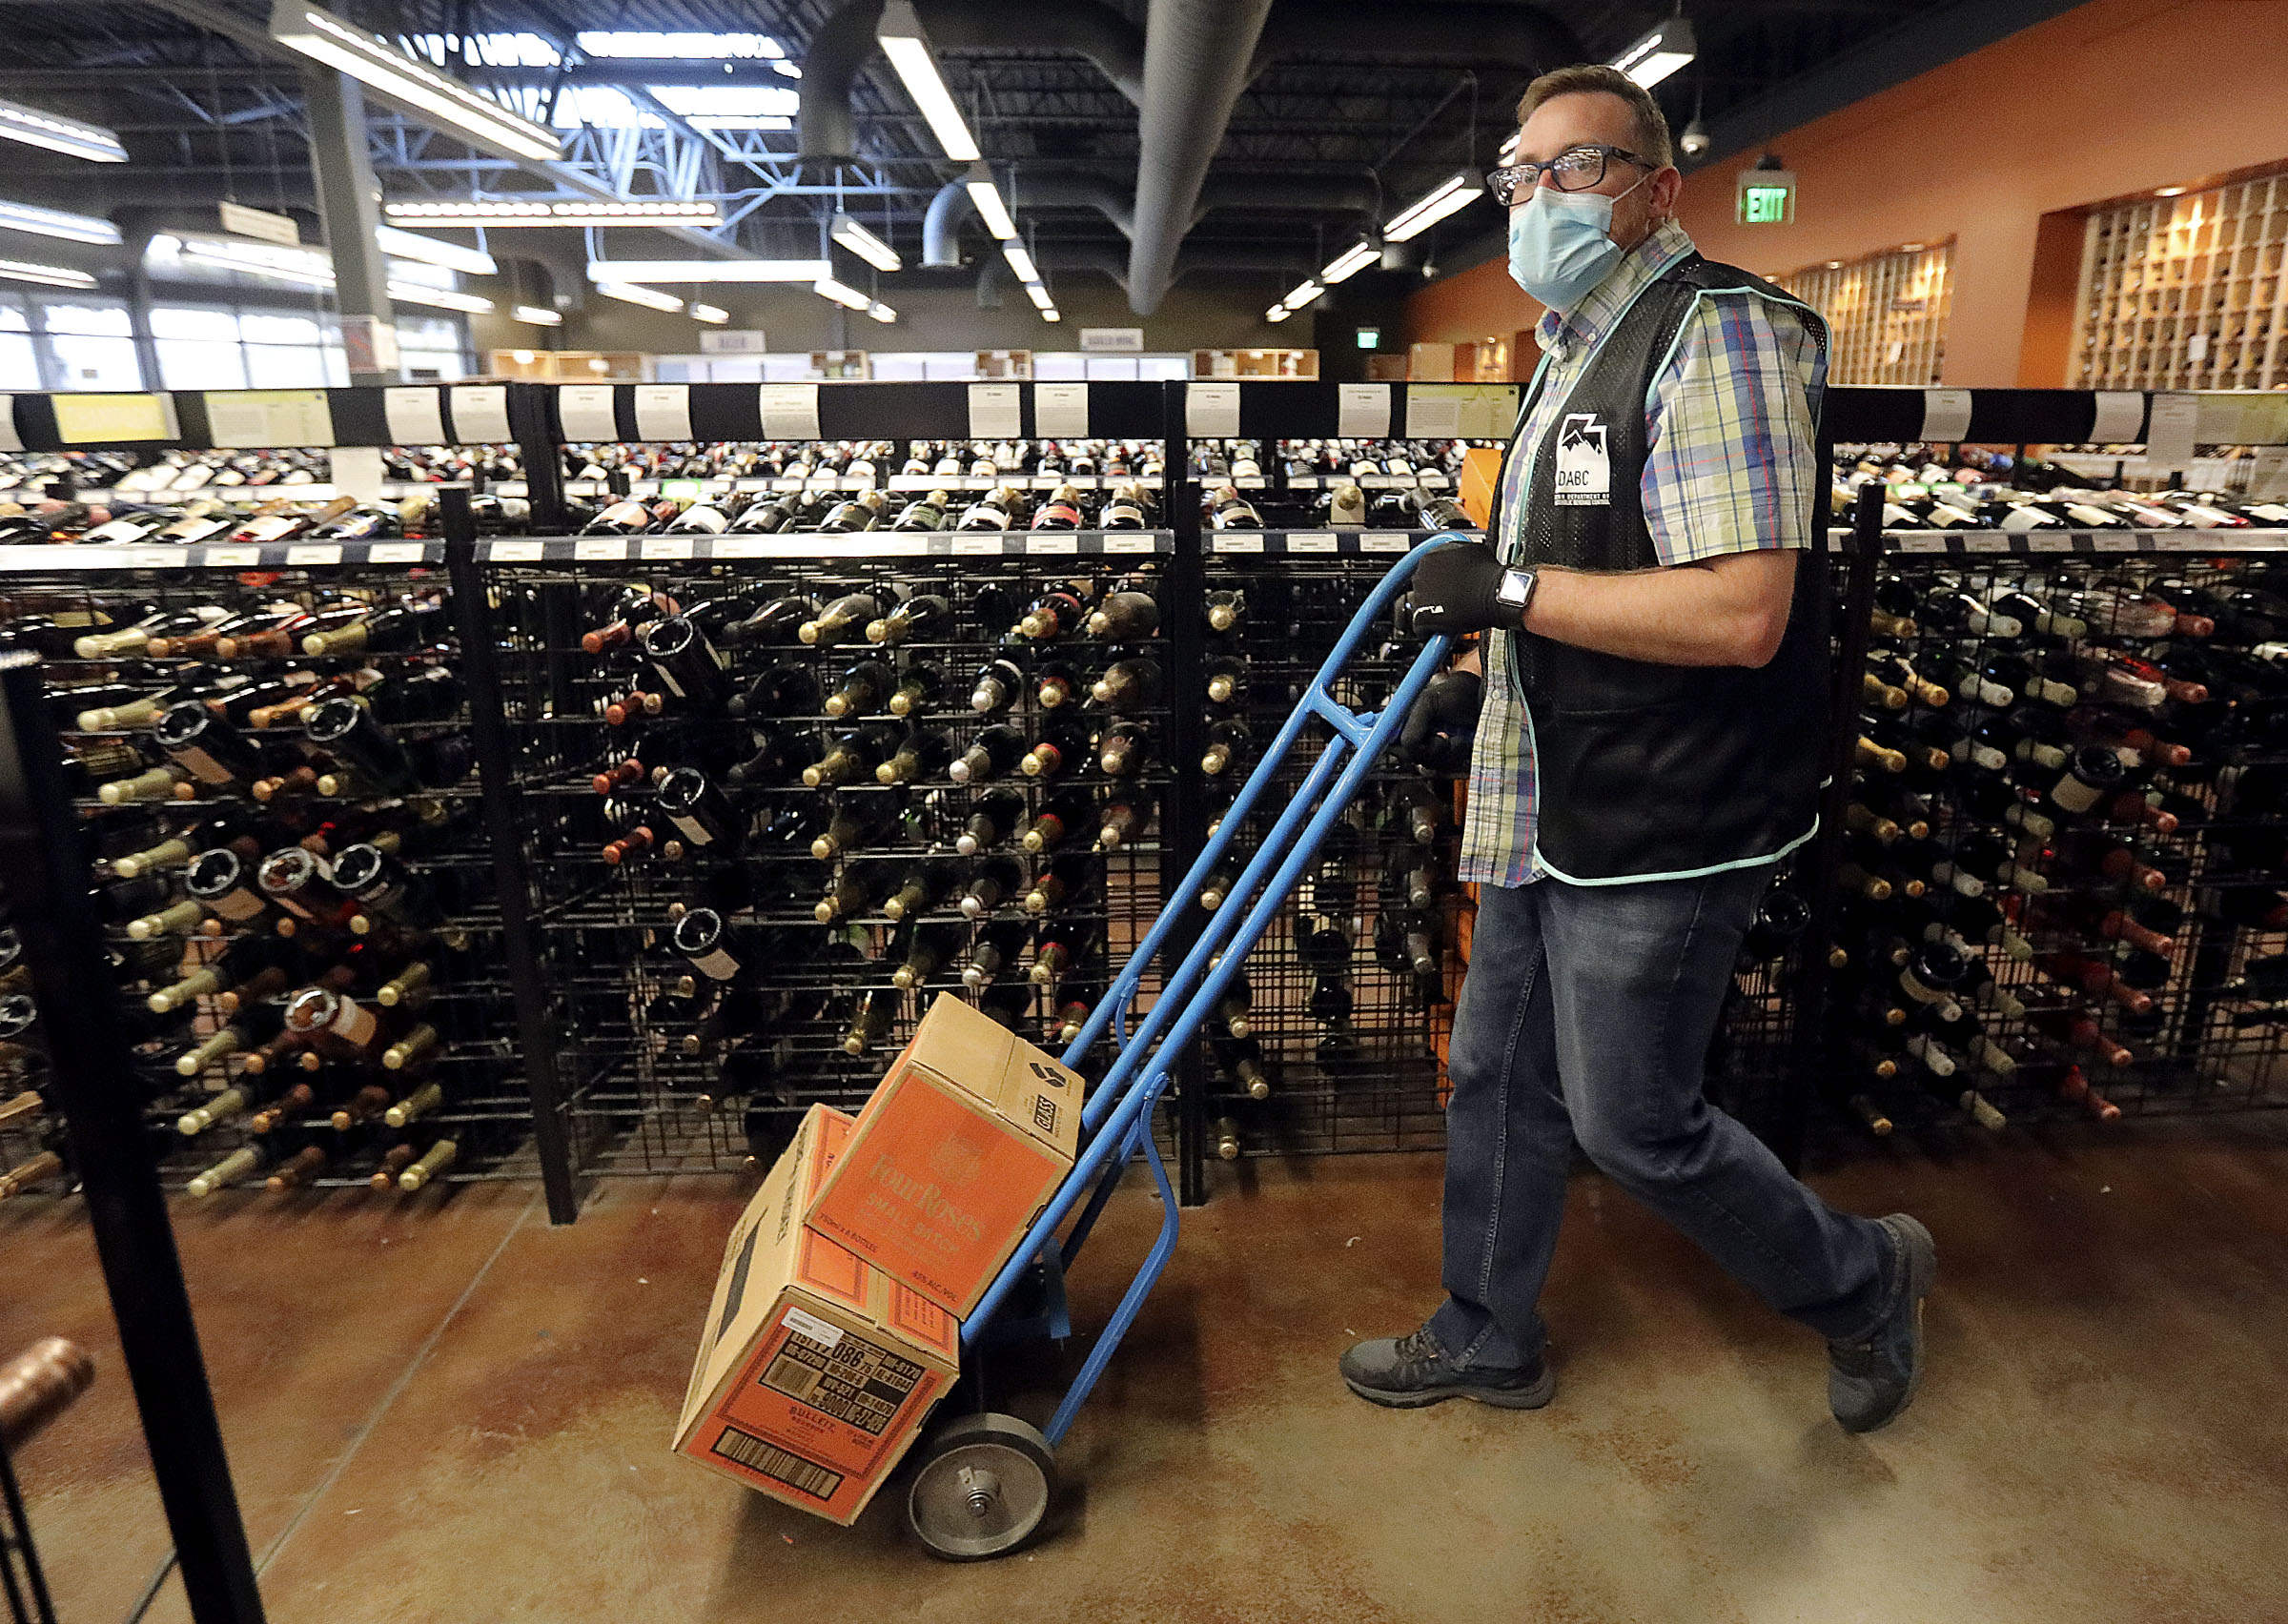 Justin Robertson, a full-time staffer, works atstate liquor storein Salt Lake City on Friday, Oct. 23, 2020.